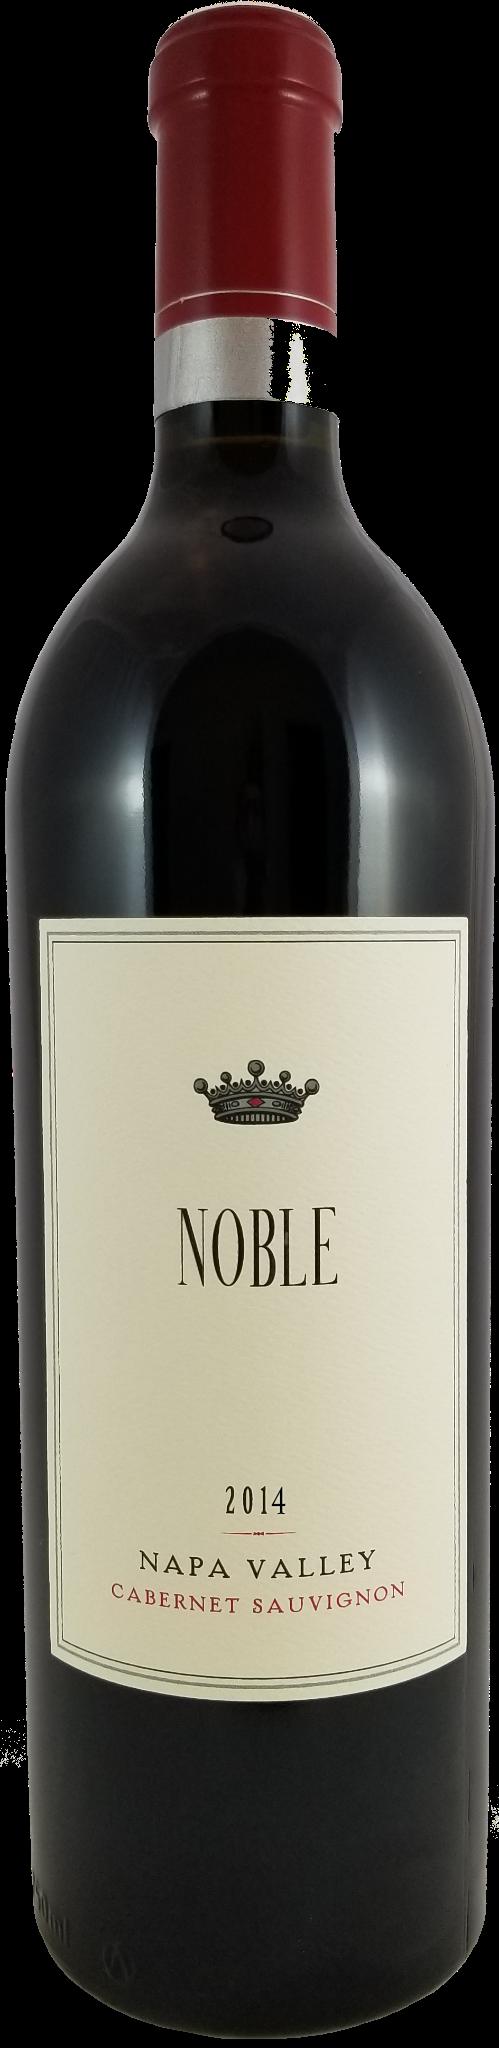 noble-2014-cabernet-sauvginon-1-1-1